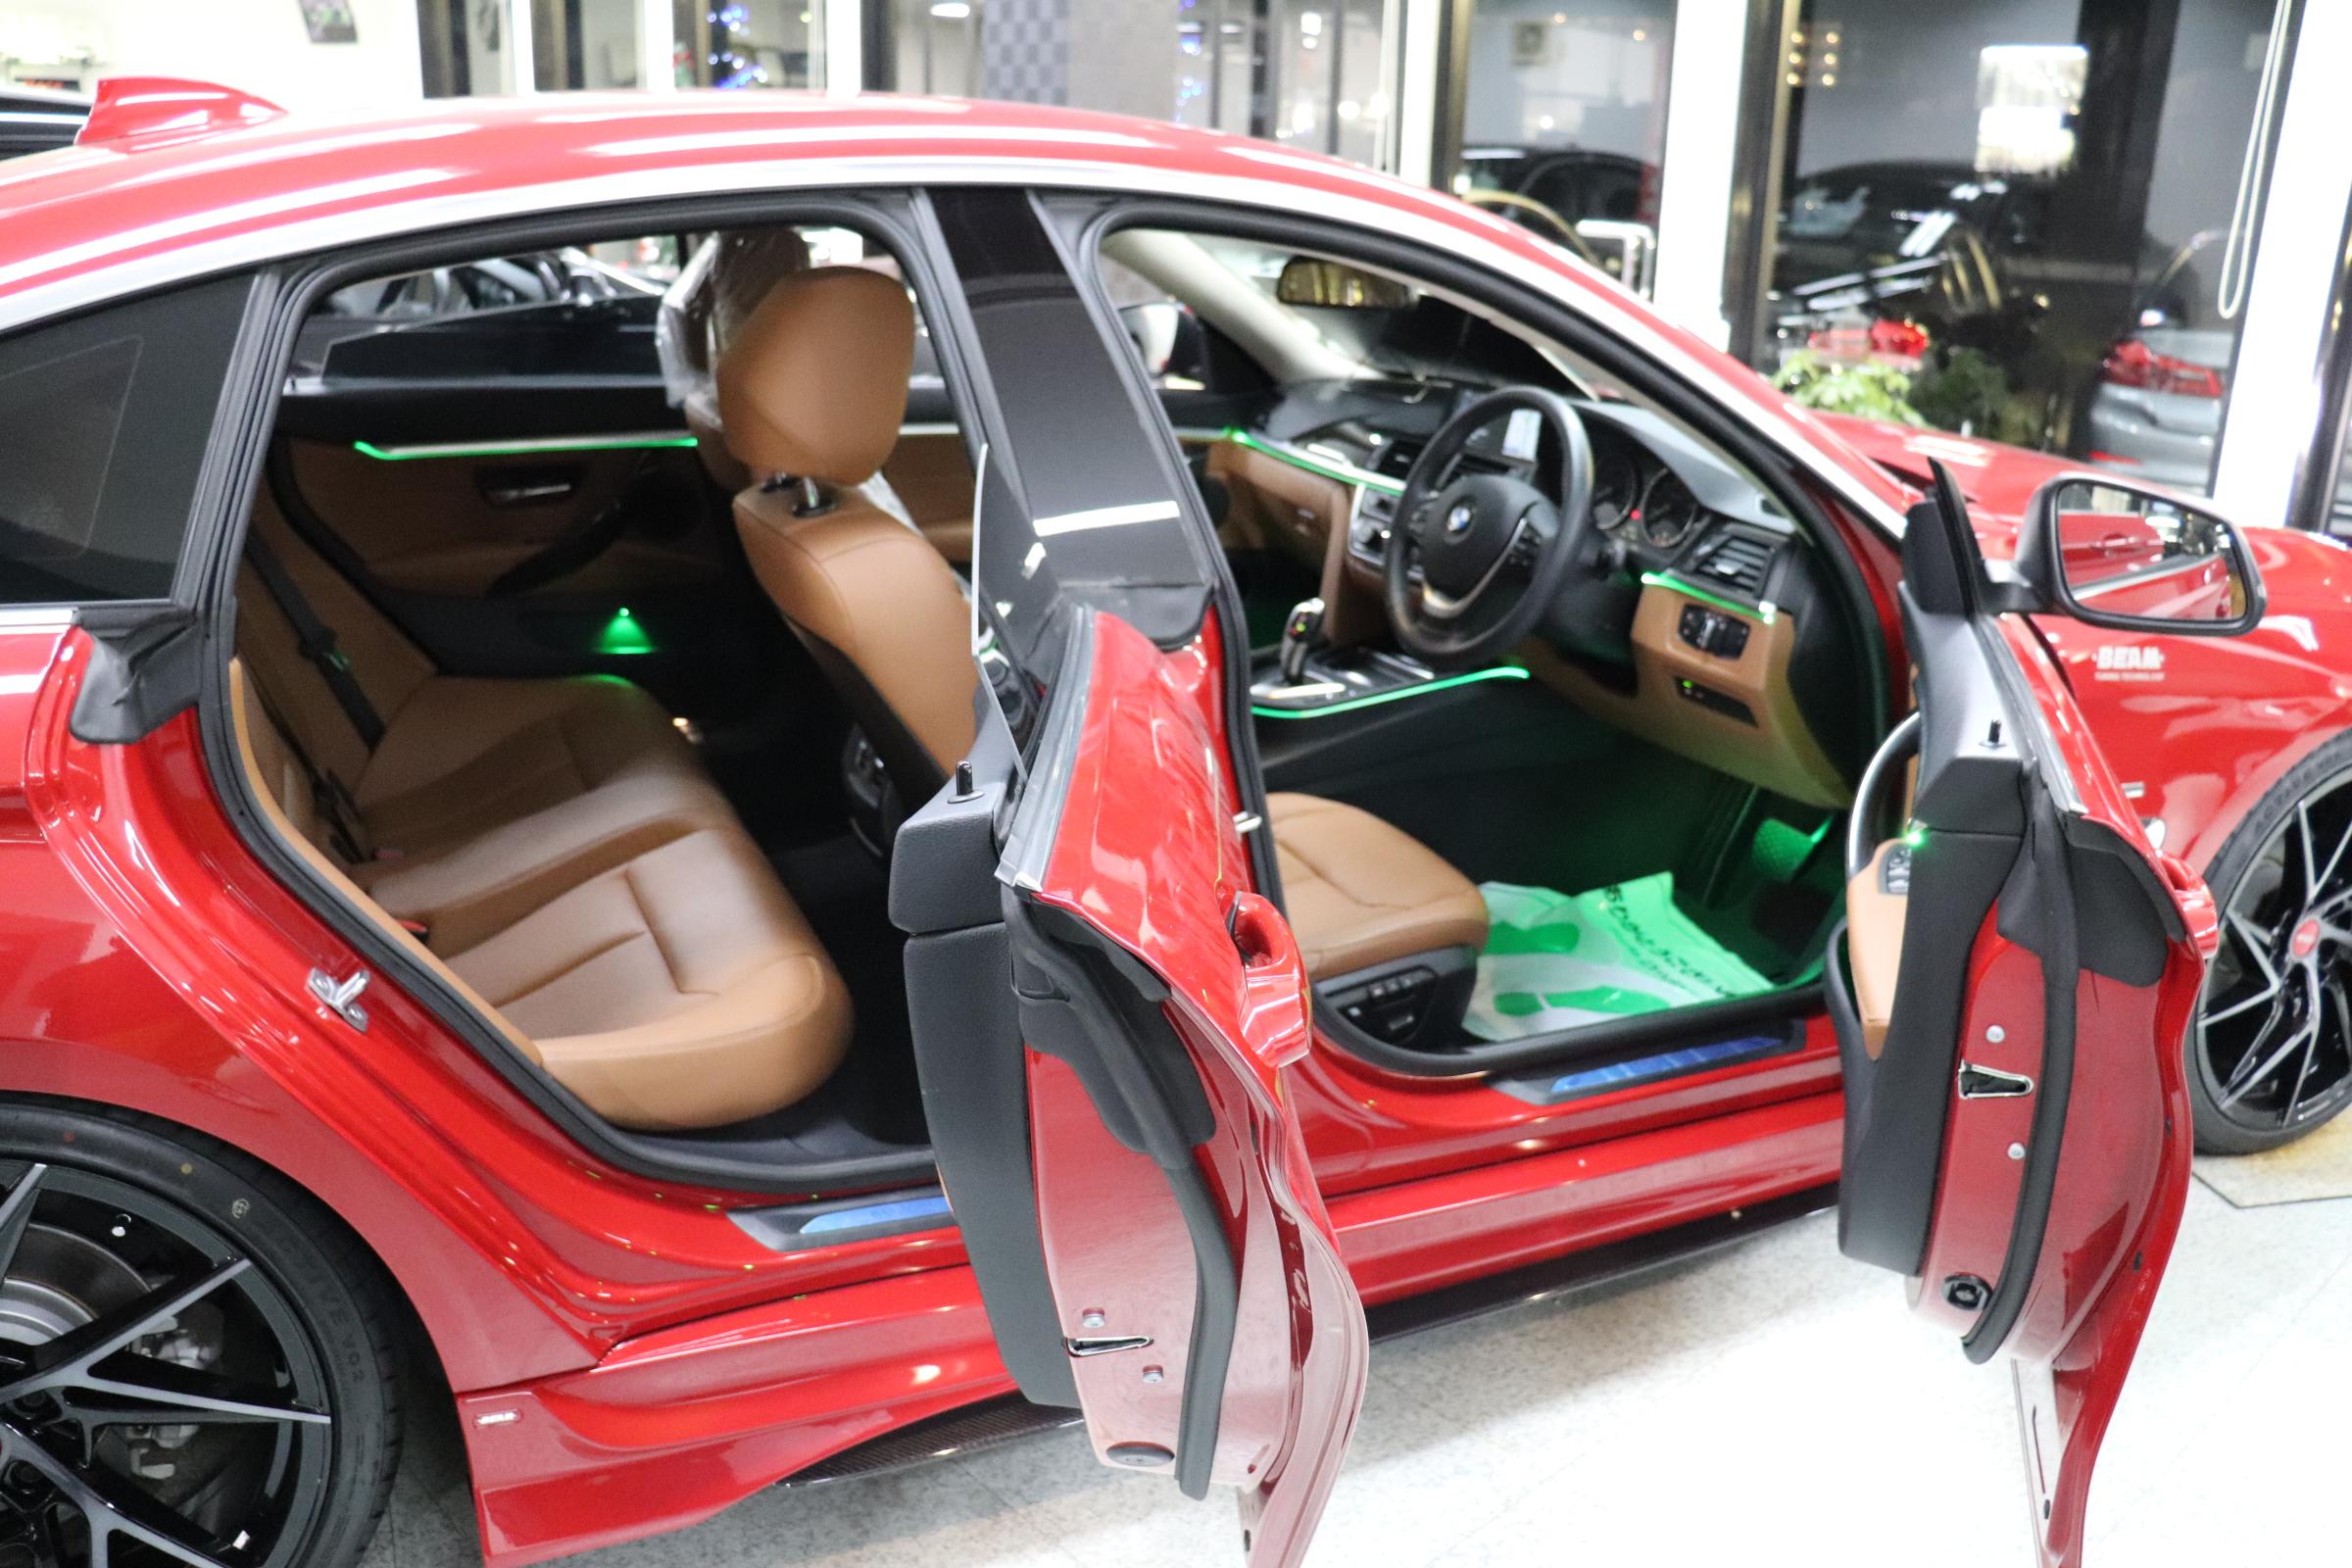 420iグランクーペラグジュアリーBEAMコンプリートカー 茶革 LEDヘッドライト車両画像14